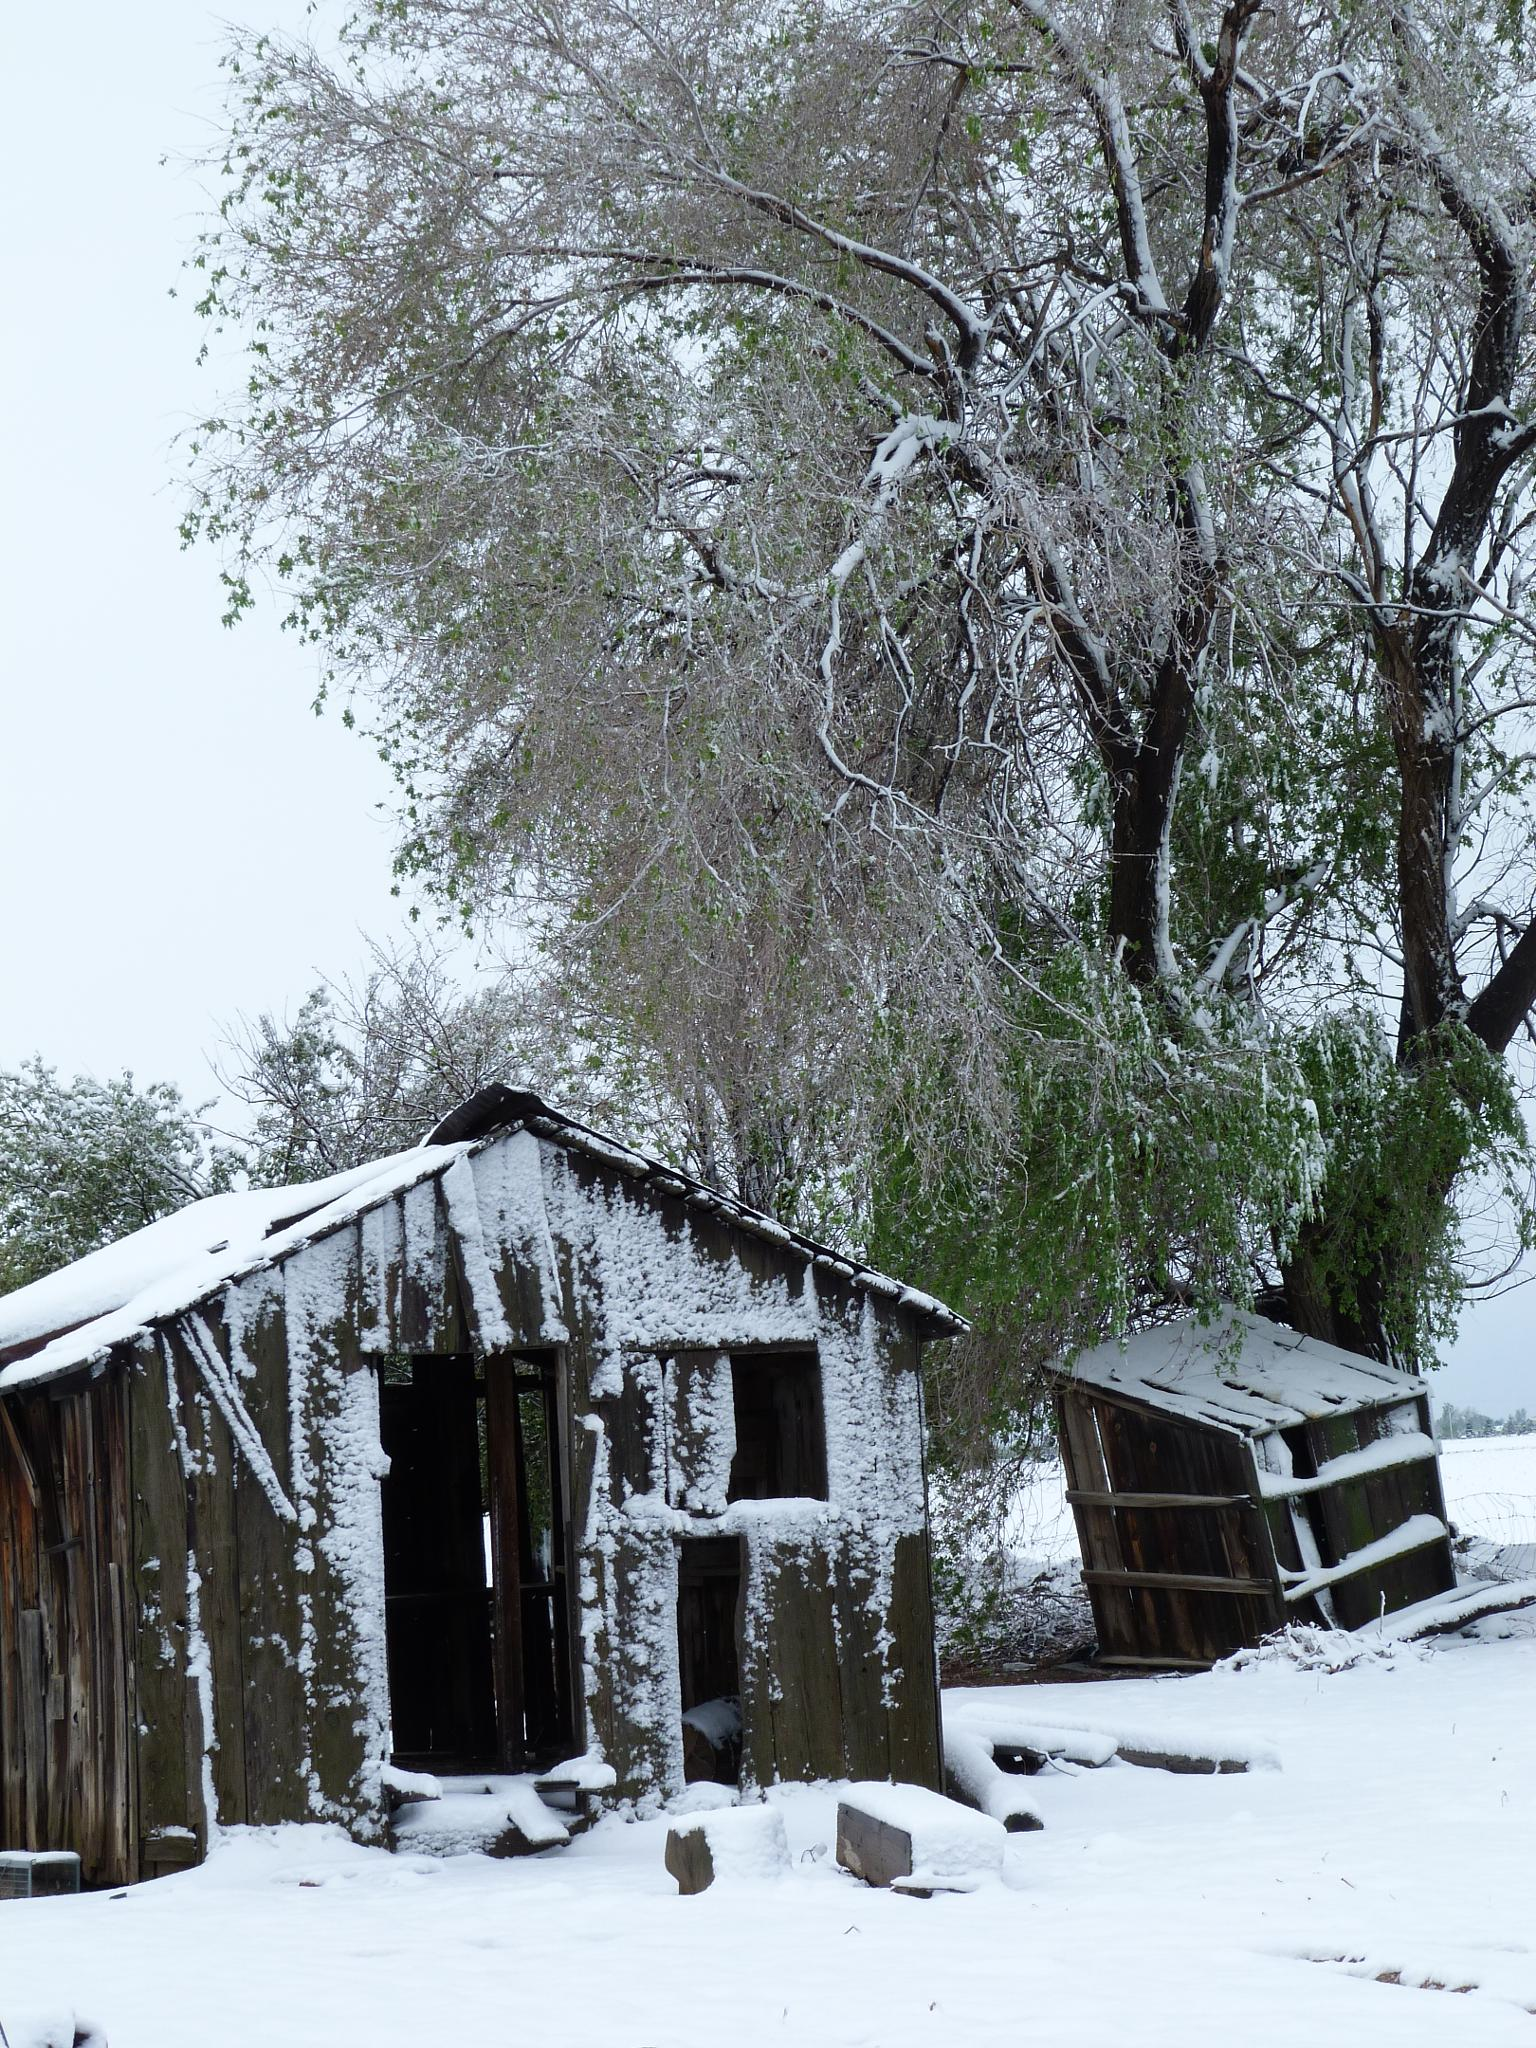 late spring storm on the family farm  by NaomiThomsenCastonguay